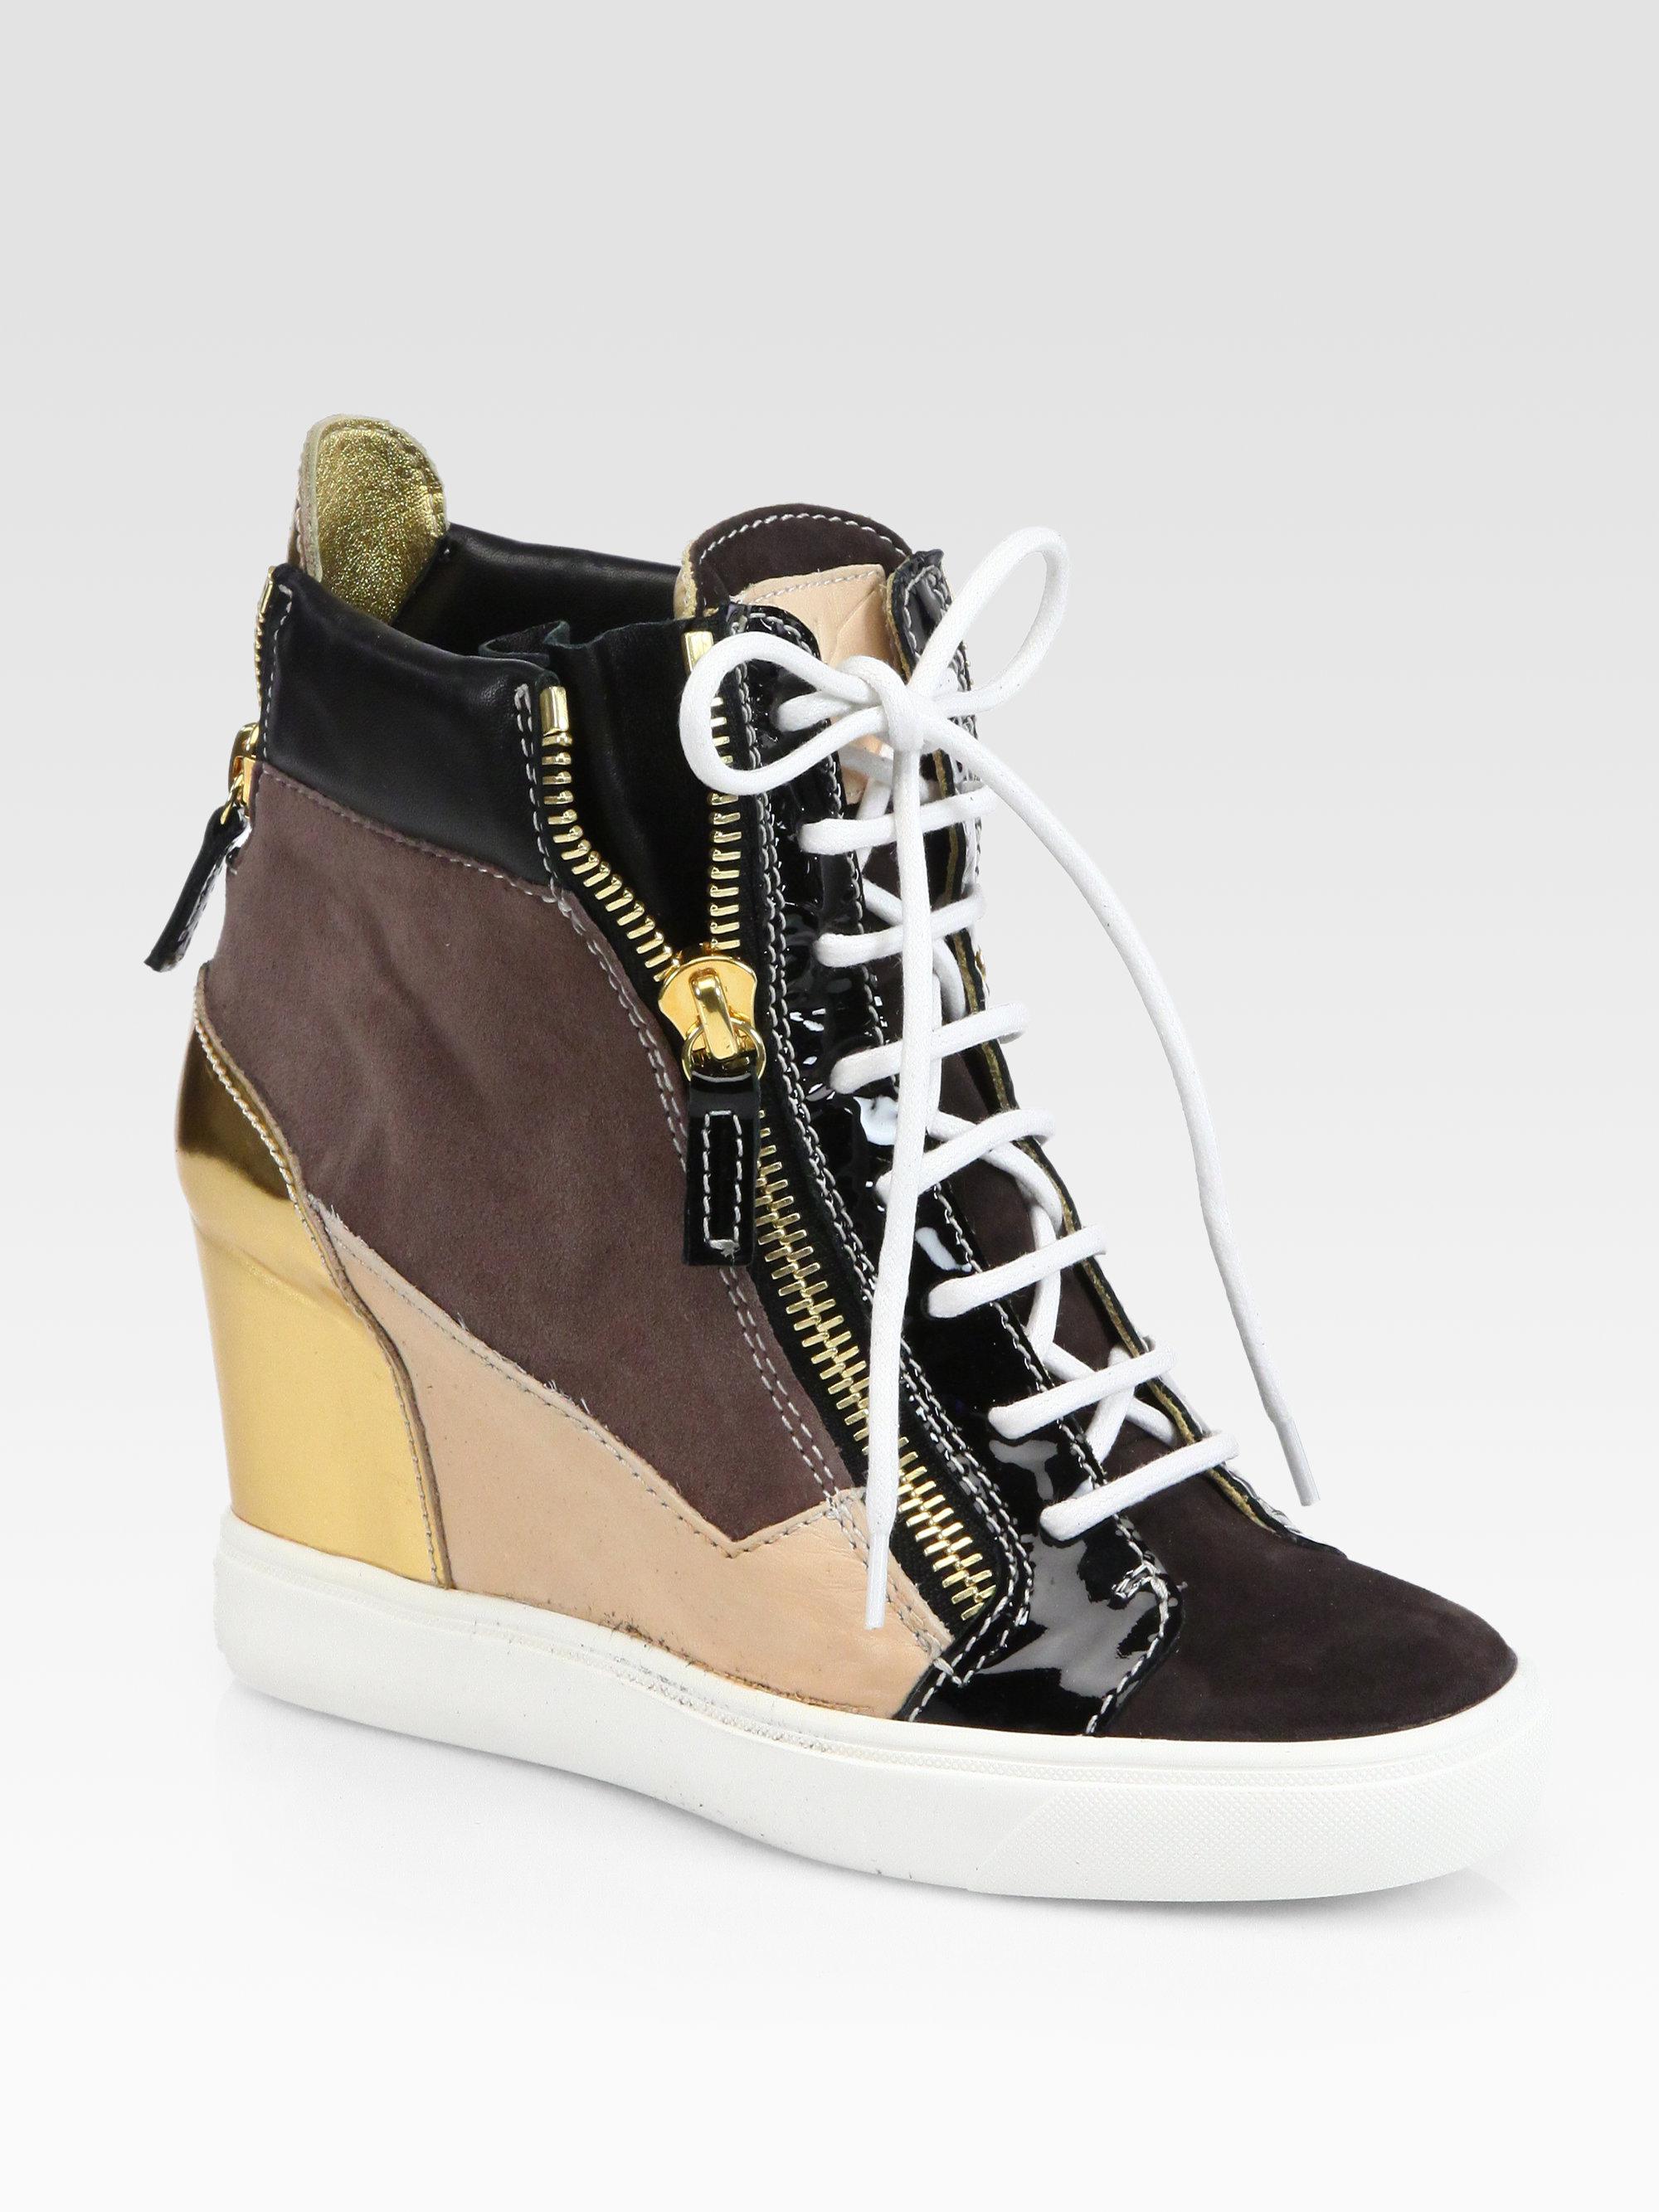 Giuseppe zanotti high heels outlet garden house lazzerini for Zanotti arredamenti